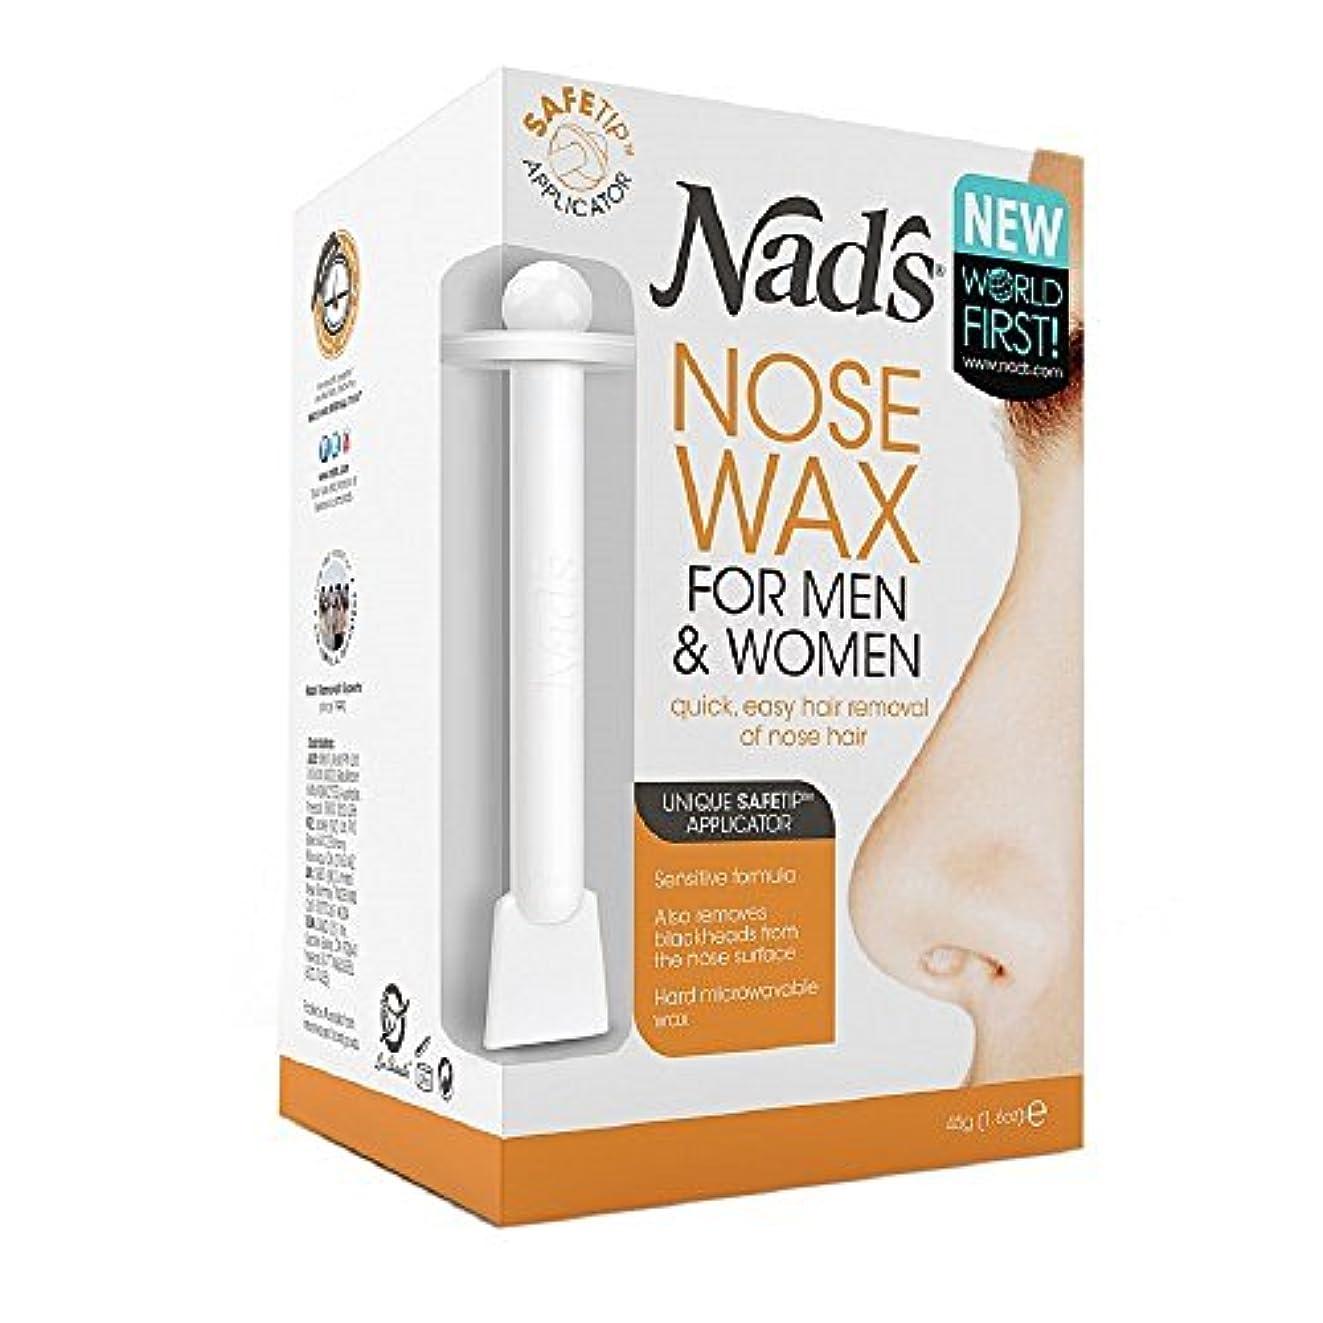 NAD'S 鼻ワックス1.6オズ(3パック) 3パック